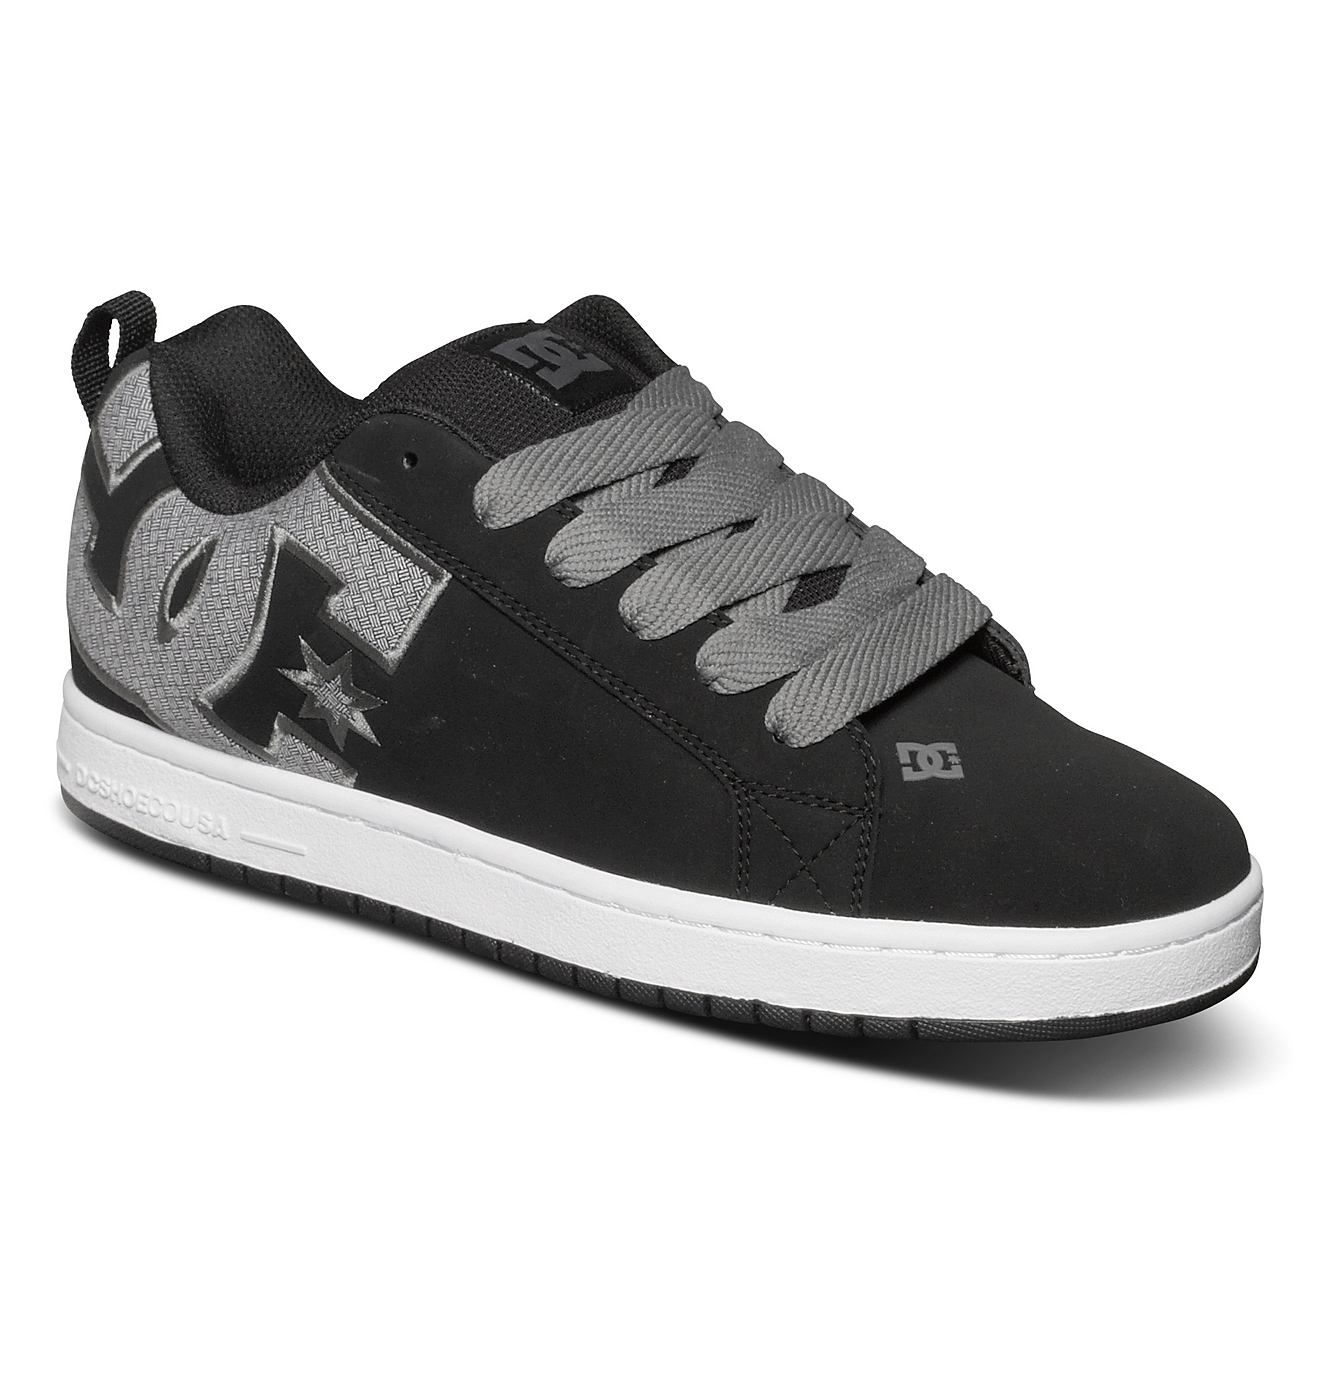 DC Herren Sneaker Trase TX Sneakers: DC Shoes: Schuhe